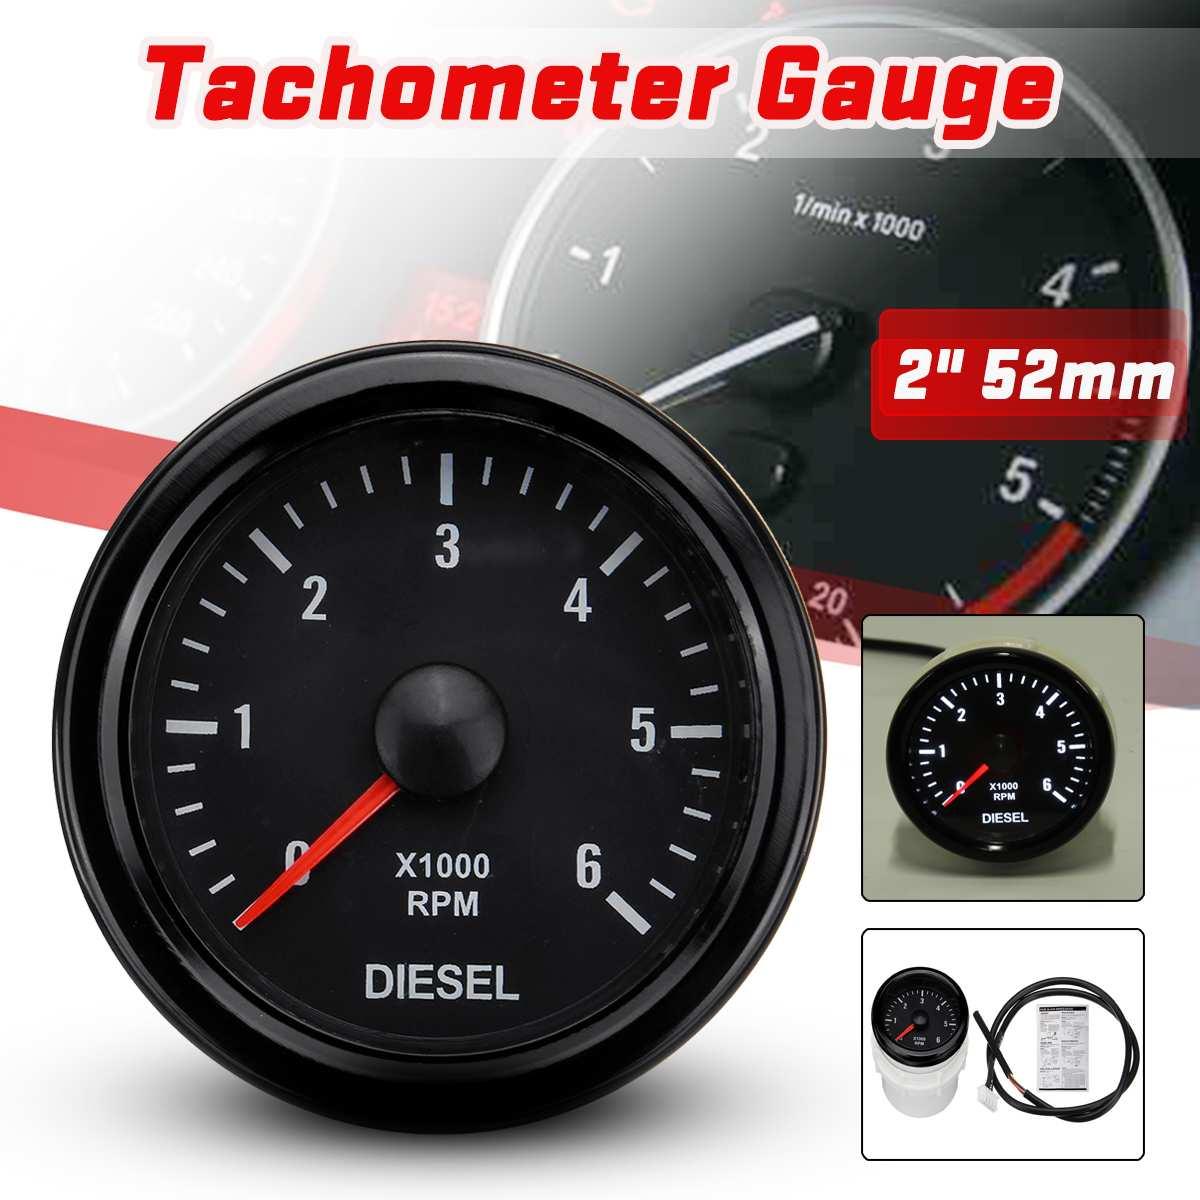 52mm 0-6000 RPM (Em traço) Branco Bitola Tachometer Elétrica Para O Motor Diesel Do Motor